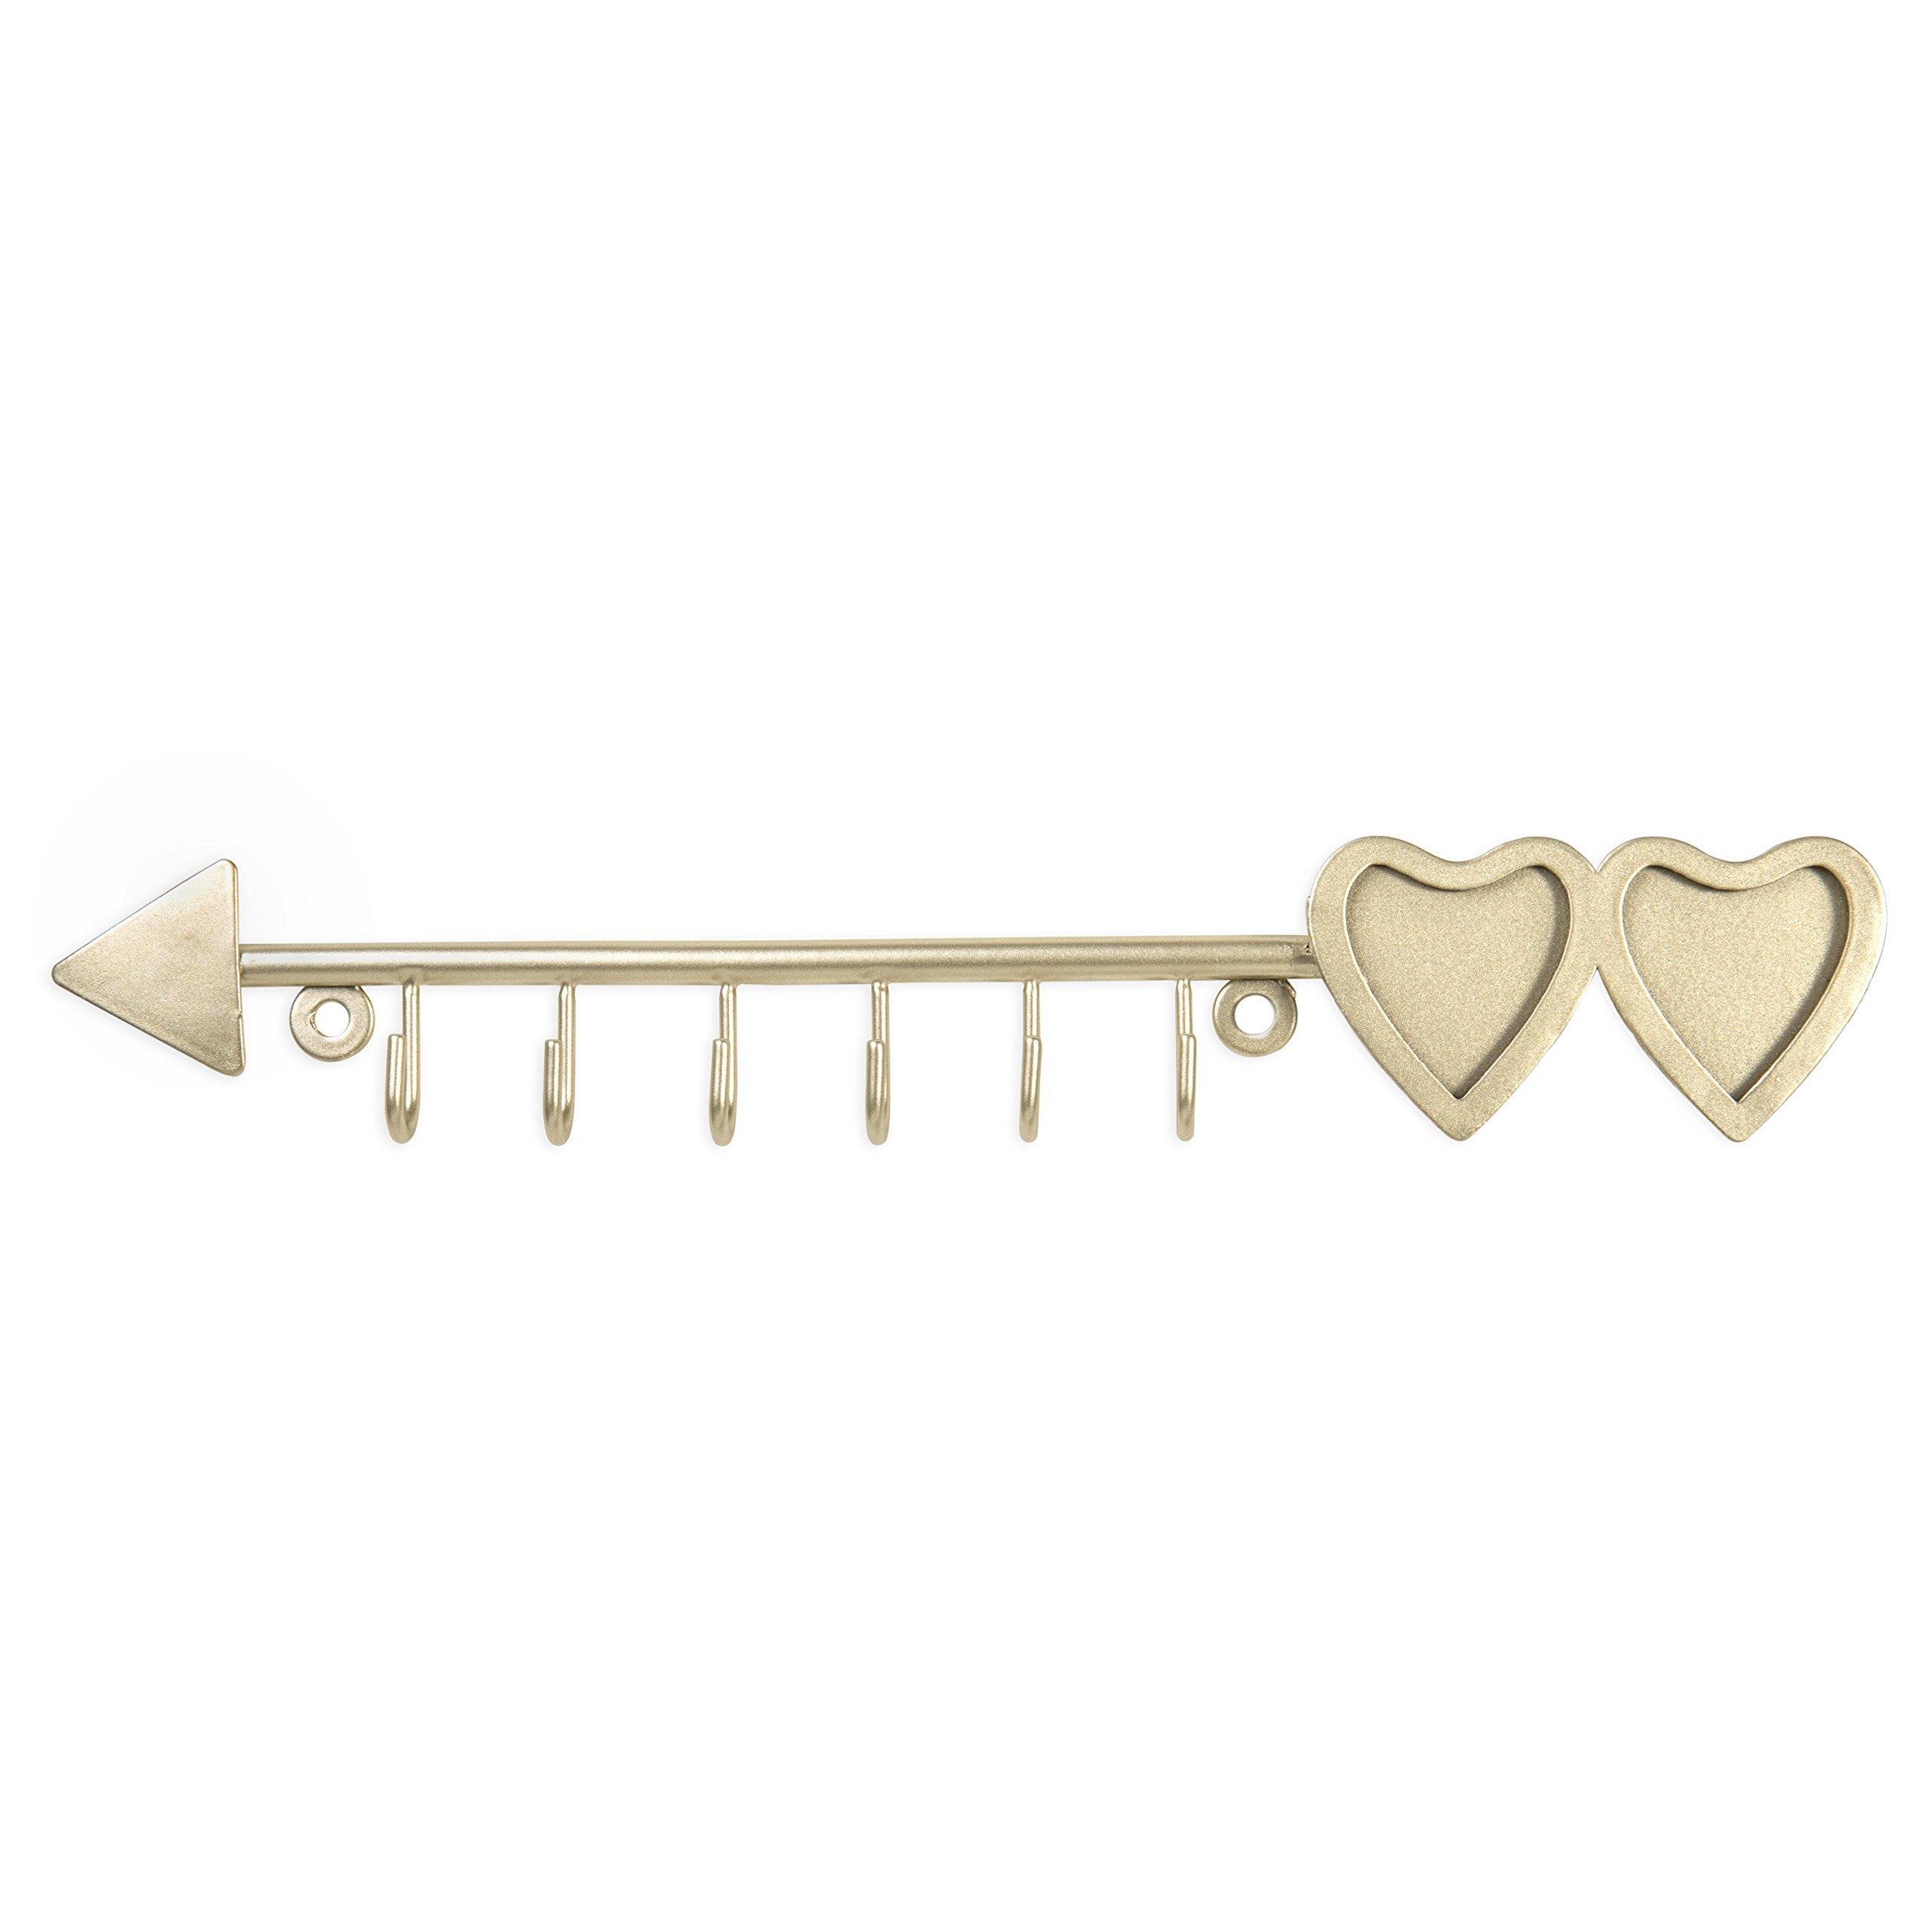 MyGift Brass-Tone Arrow Design Hanging Necklace Rack 2 Heart-Shaped Photo Frames